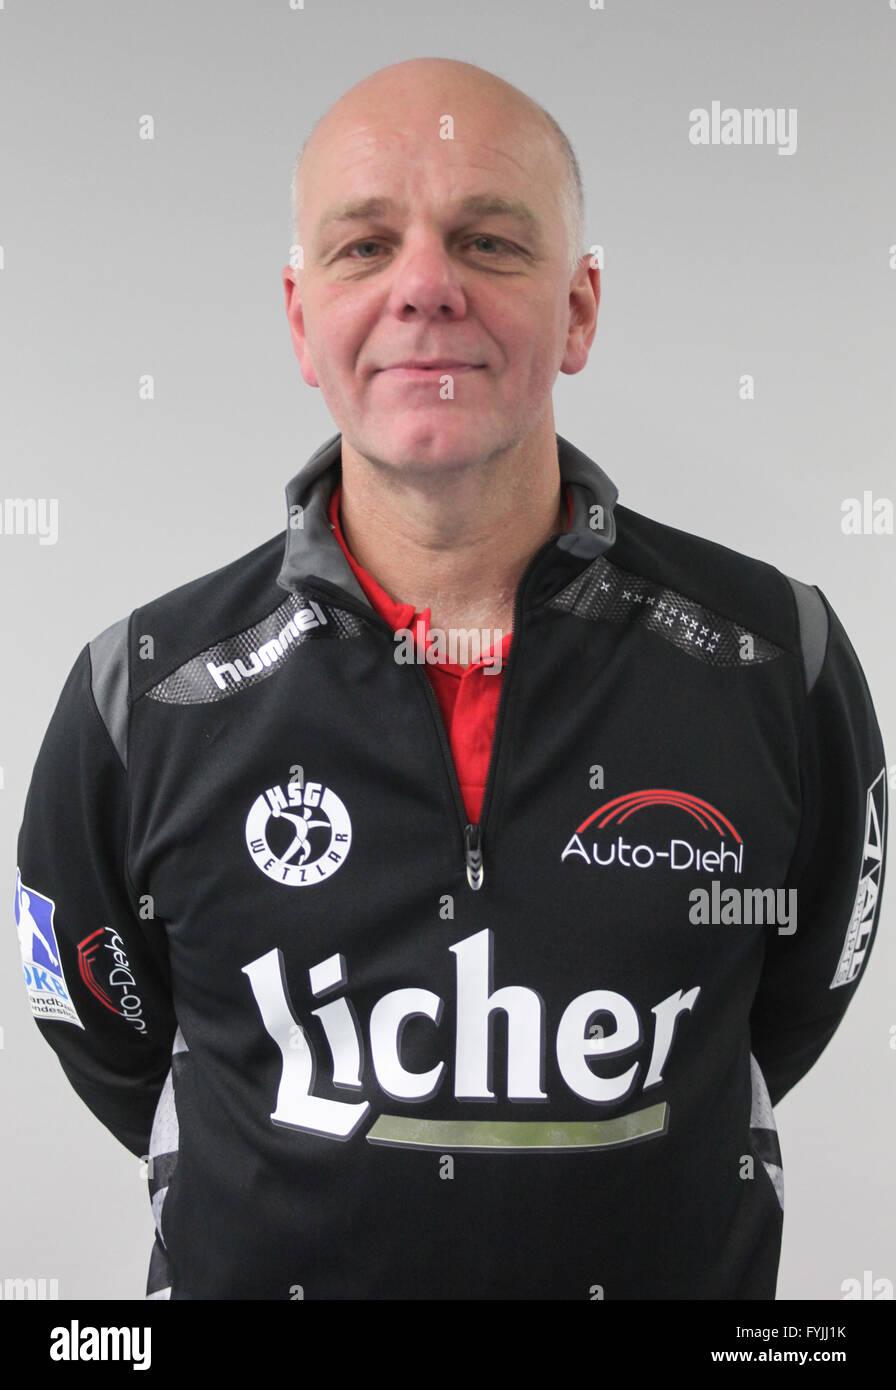 Kai Wandschneider - Stock Image